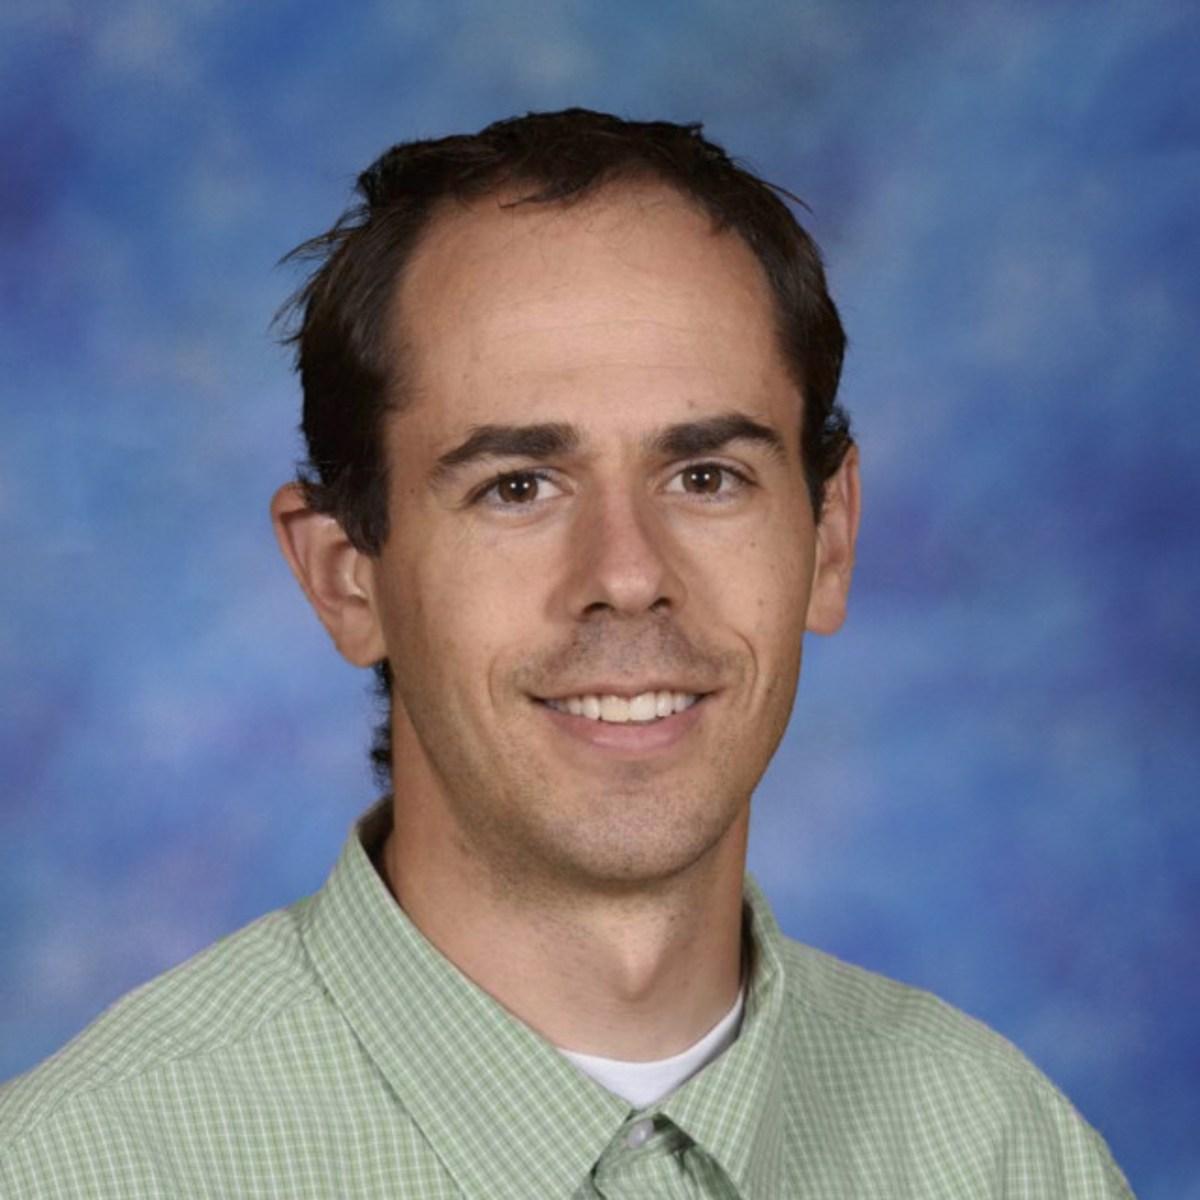 Stem School Highlands Ranch: Dr. Michael Huntington